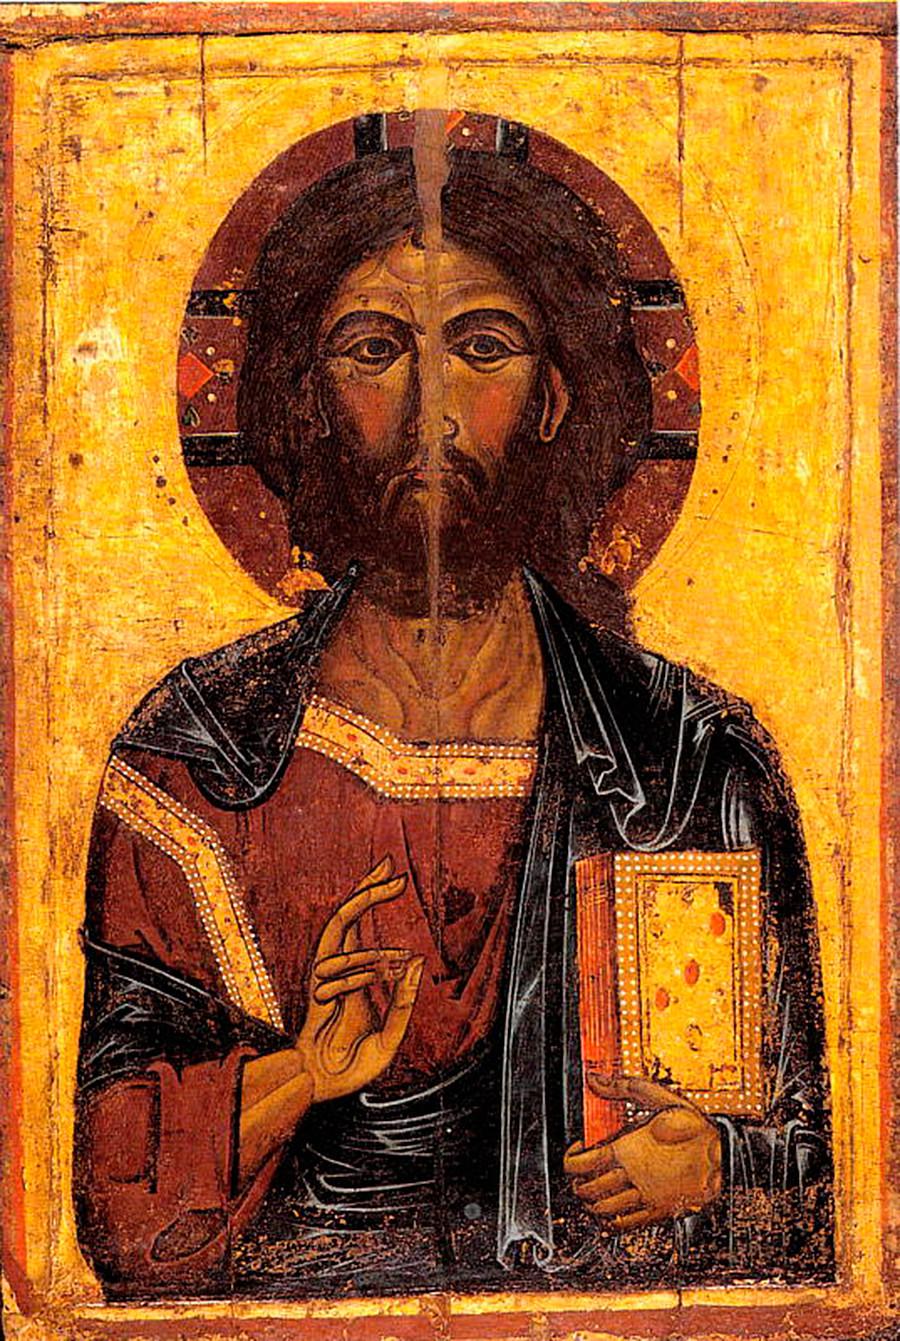 L'icône du Christ Pantocrator de Gavchinka, un village près de Iaroslavl